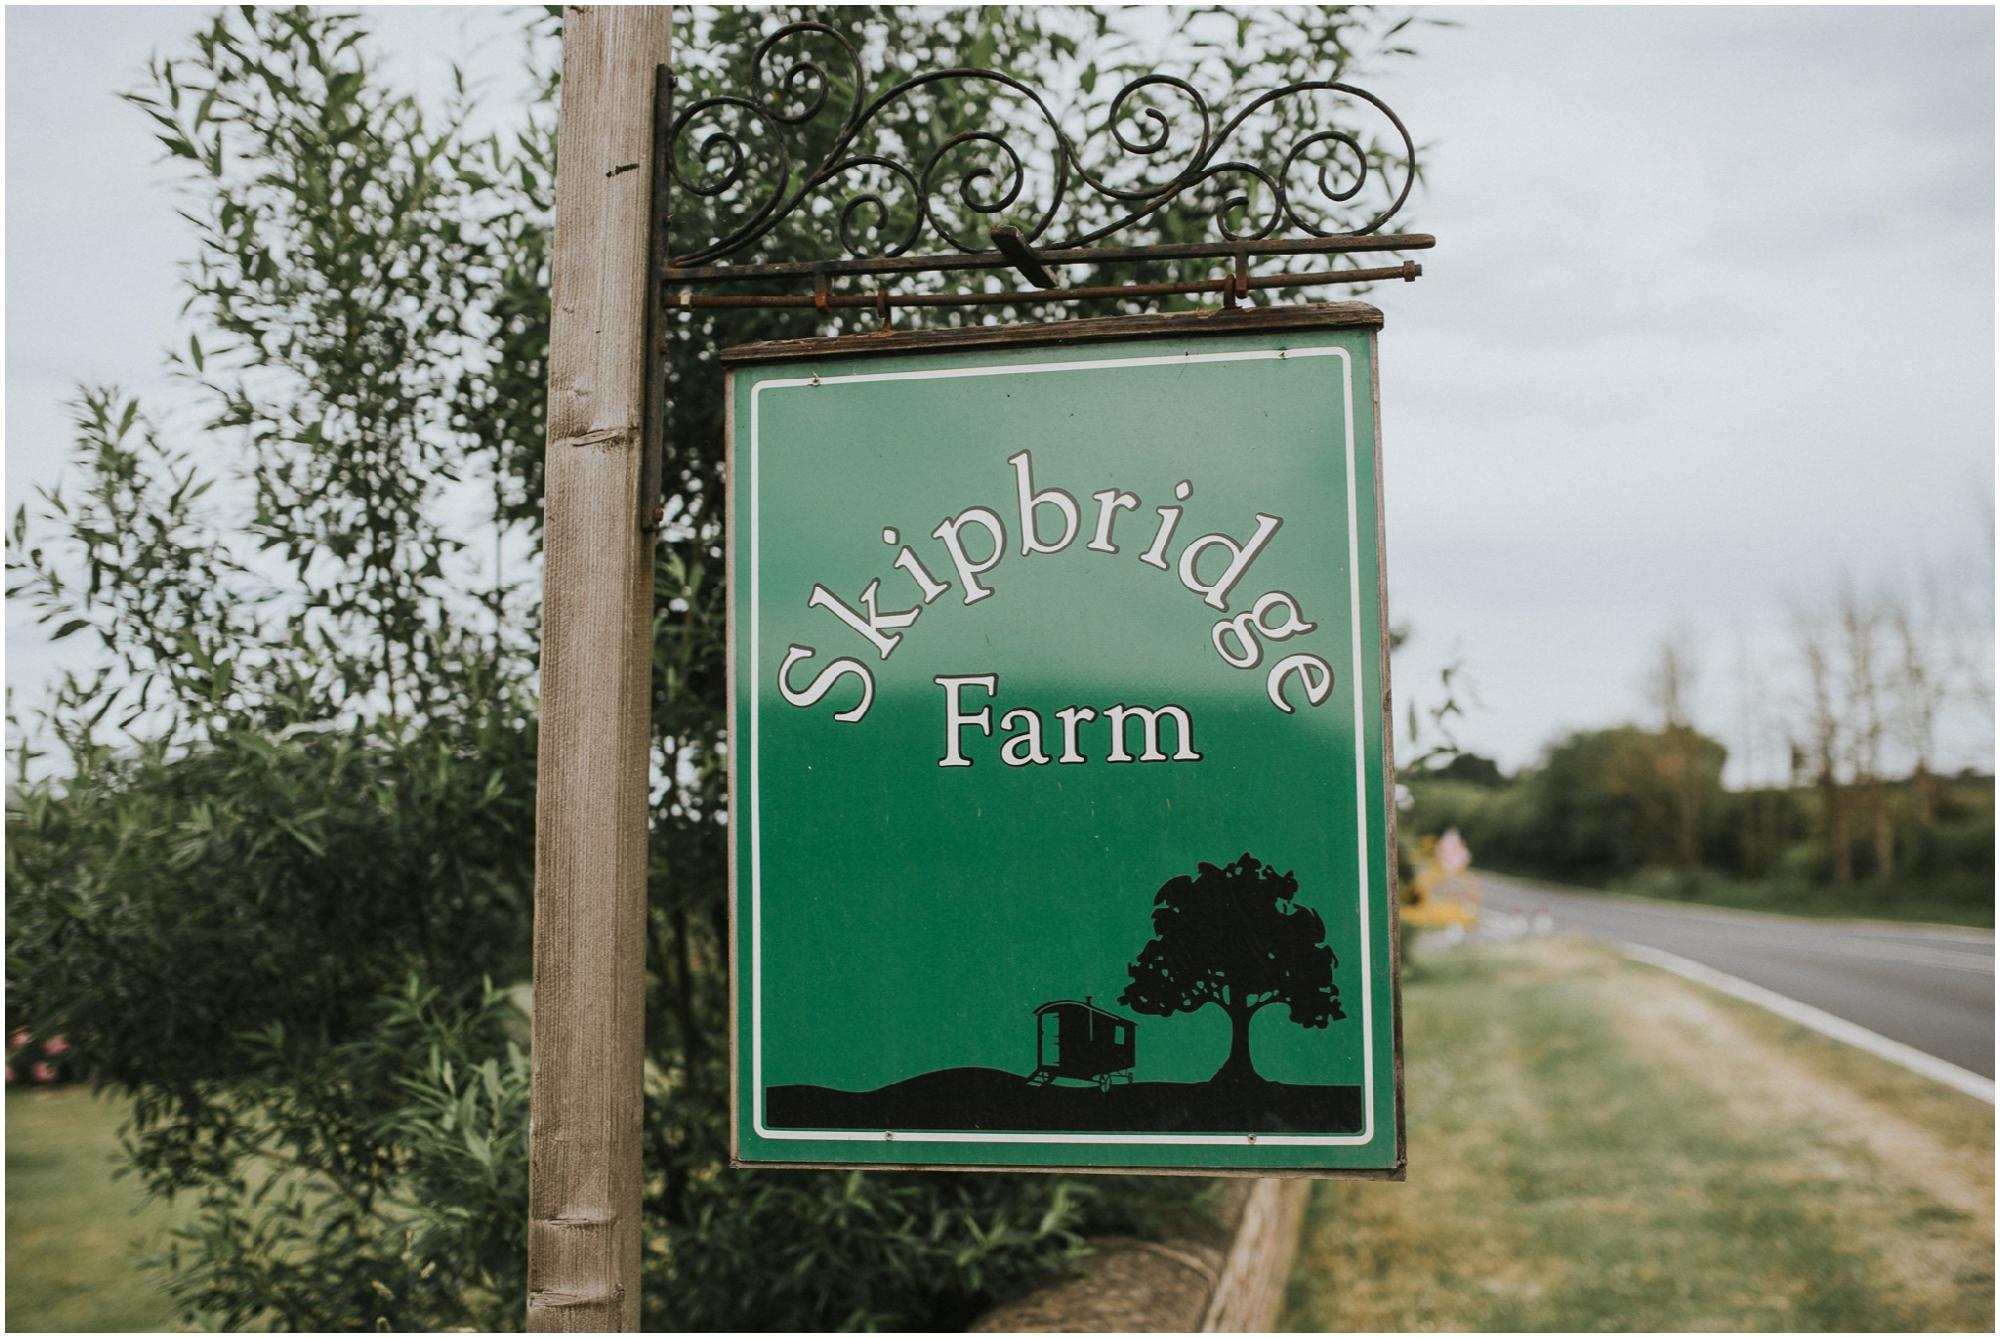 SkipbridegFarmWedding-LukeHolroyd-Yorkshirewedding_0005.jpg